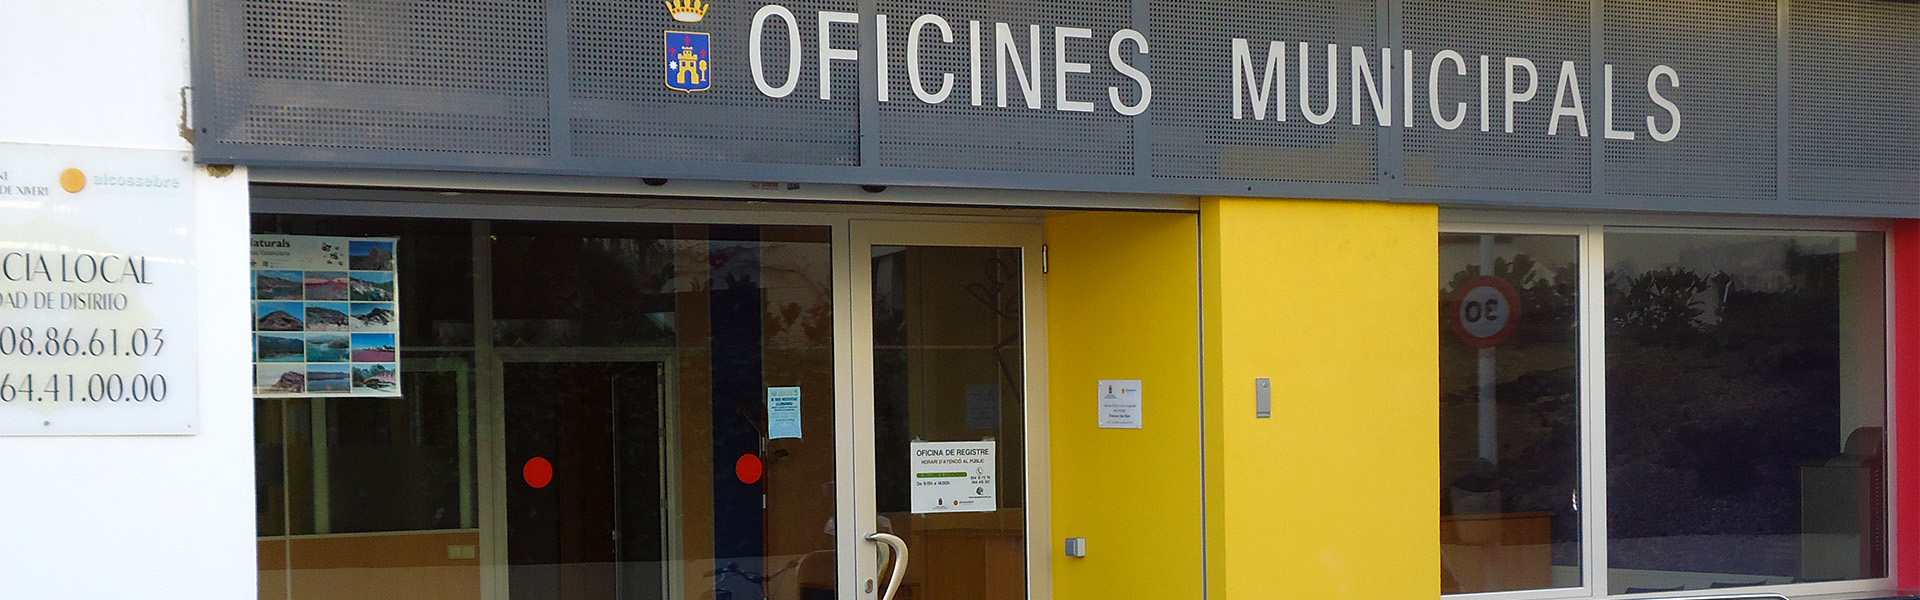 Teléfonos de Interés, oficina de turismo Alcossebre - Alcalà de Xivert